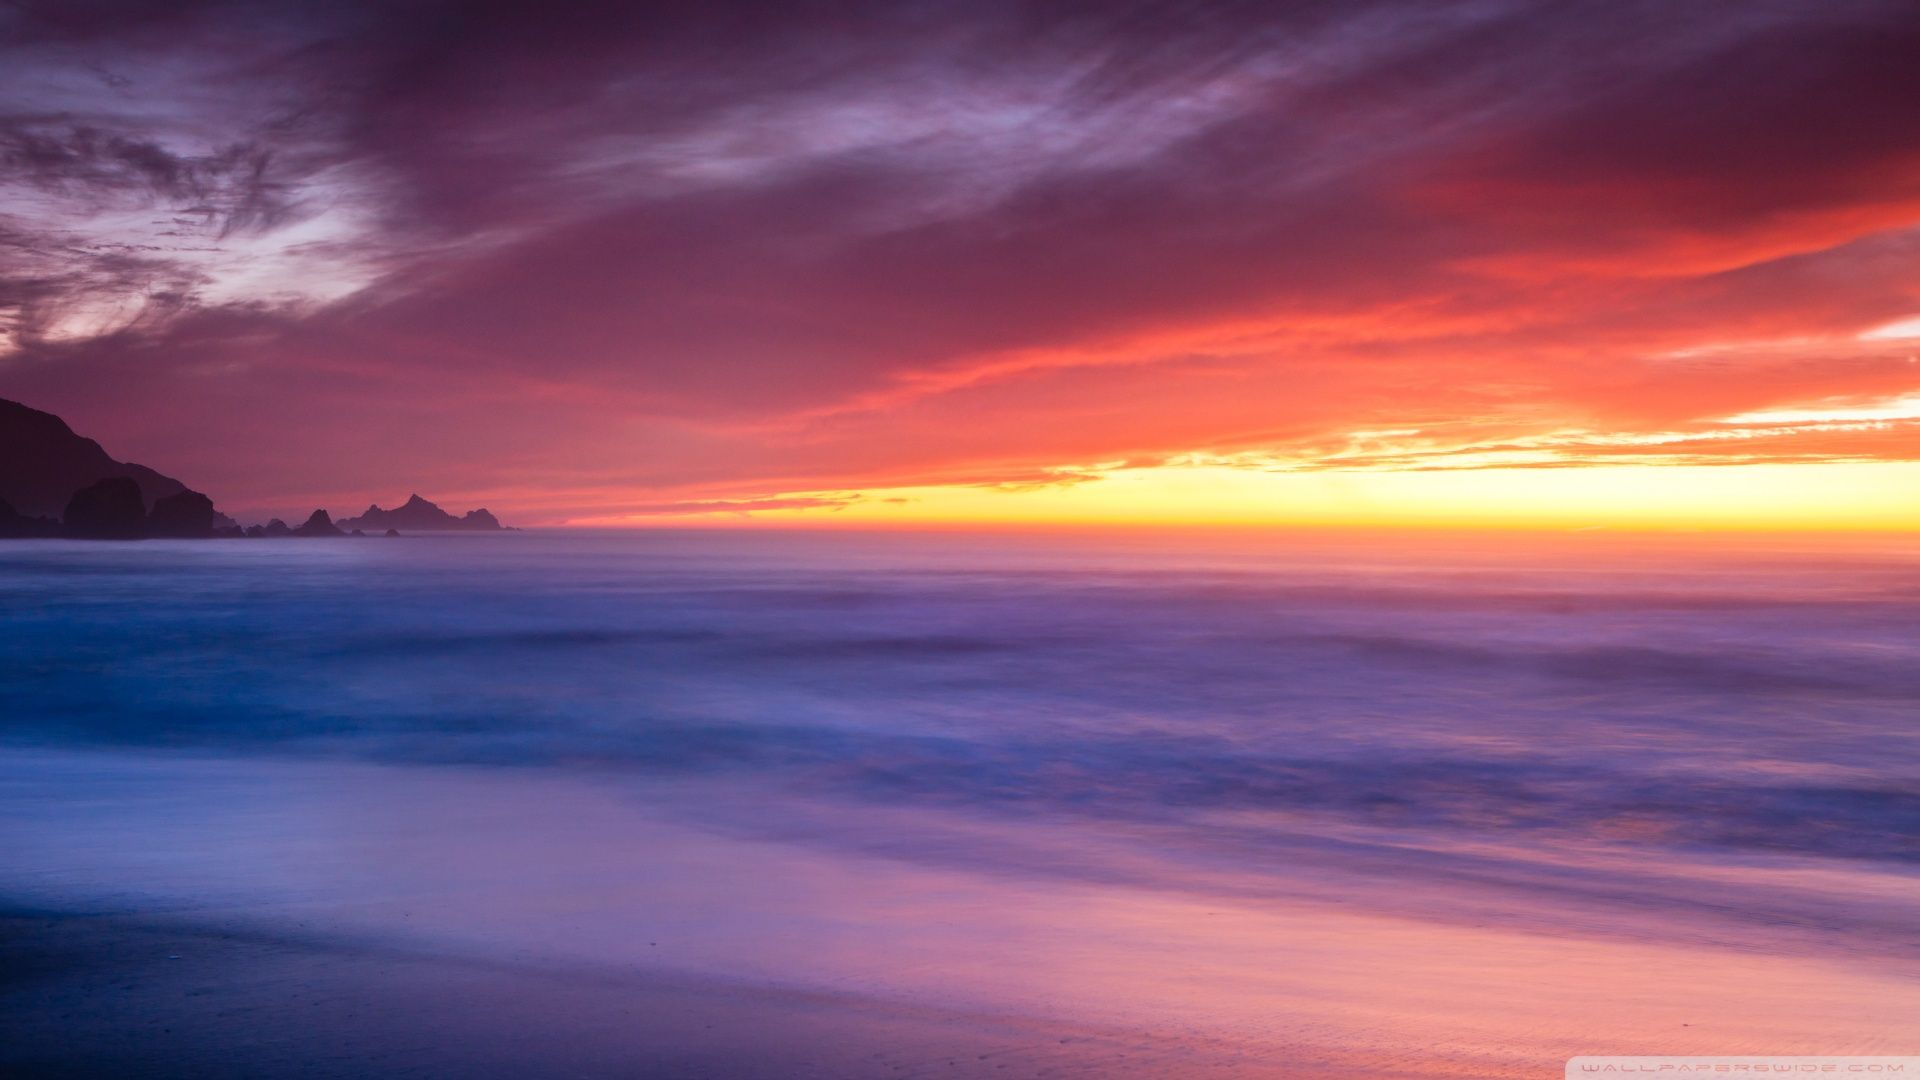 Ocean Sunset Pic